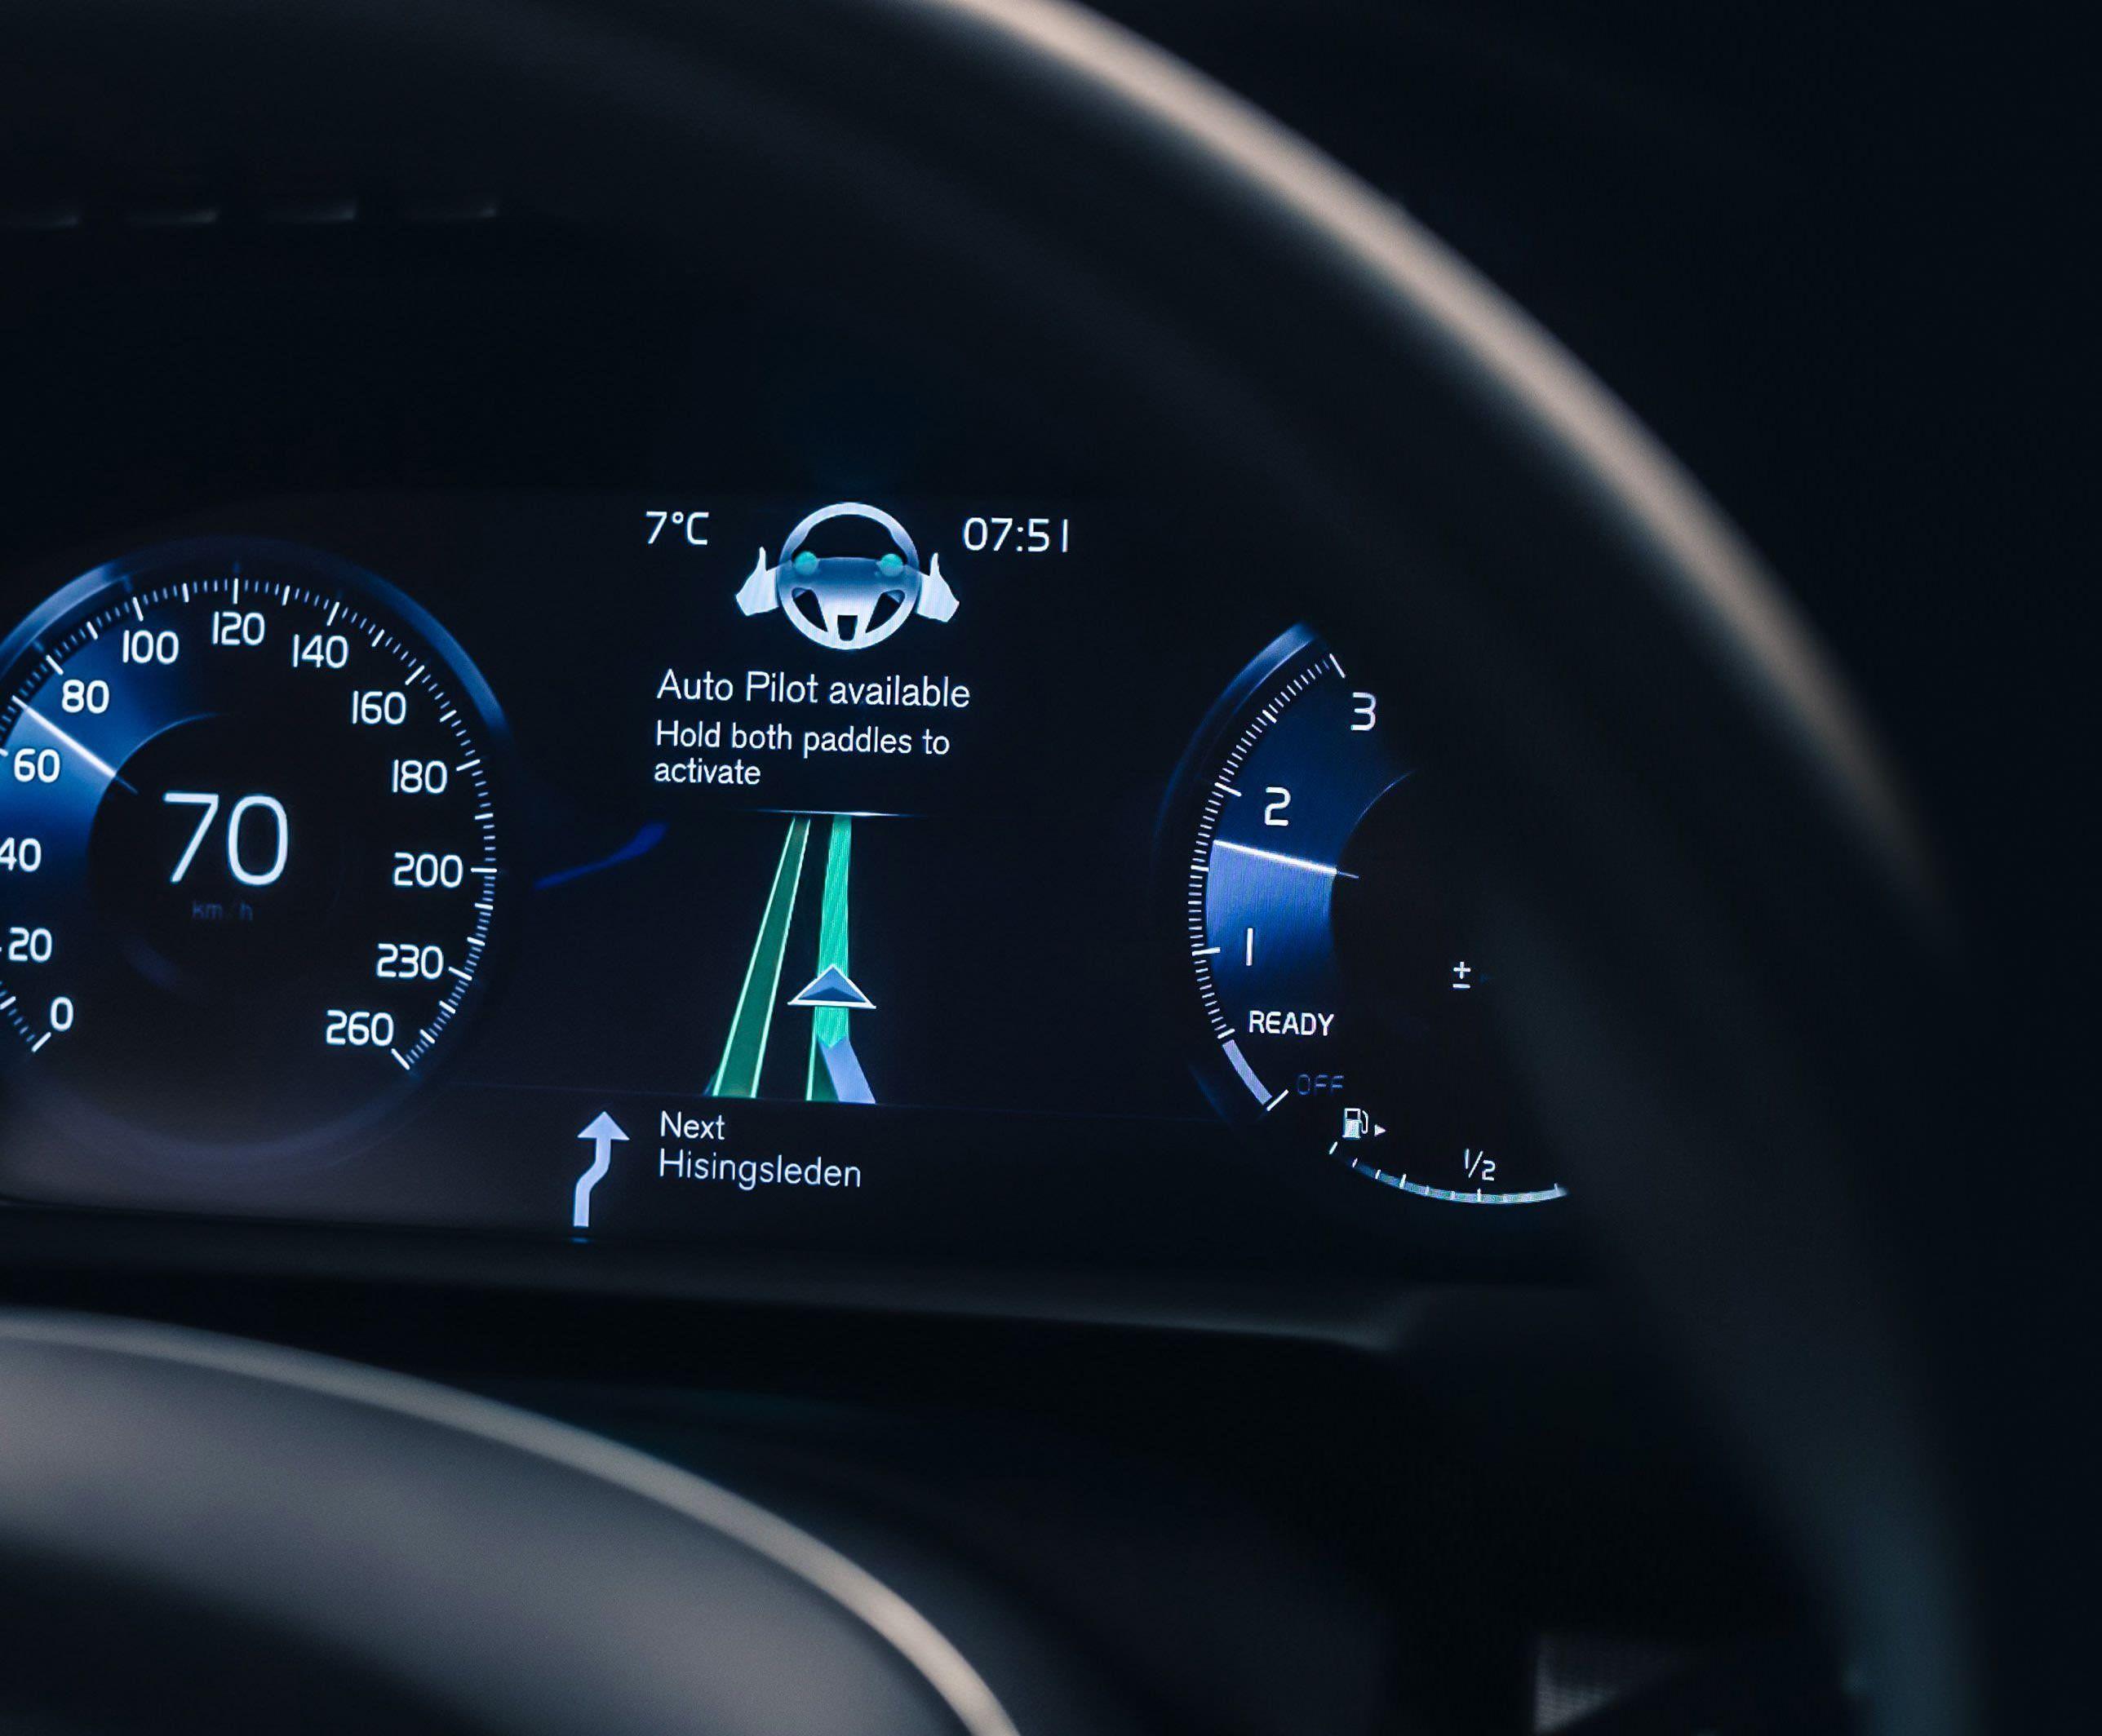 Ohio Turnpike May Soon See Self-Driving Testing